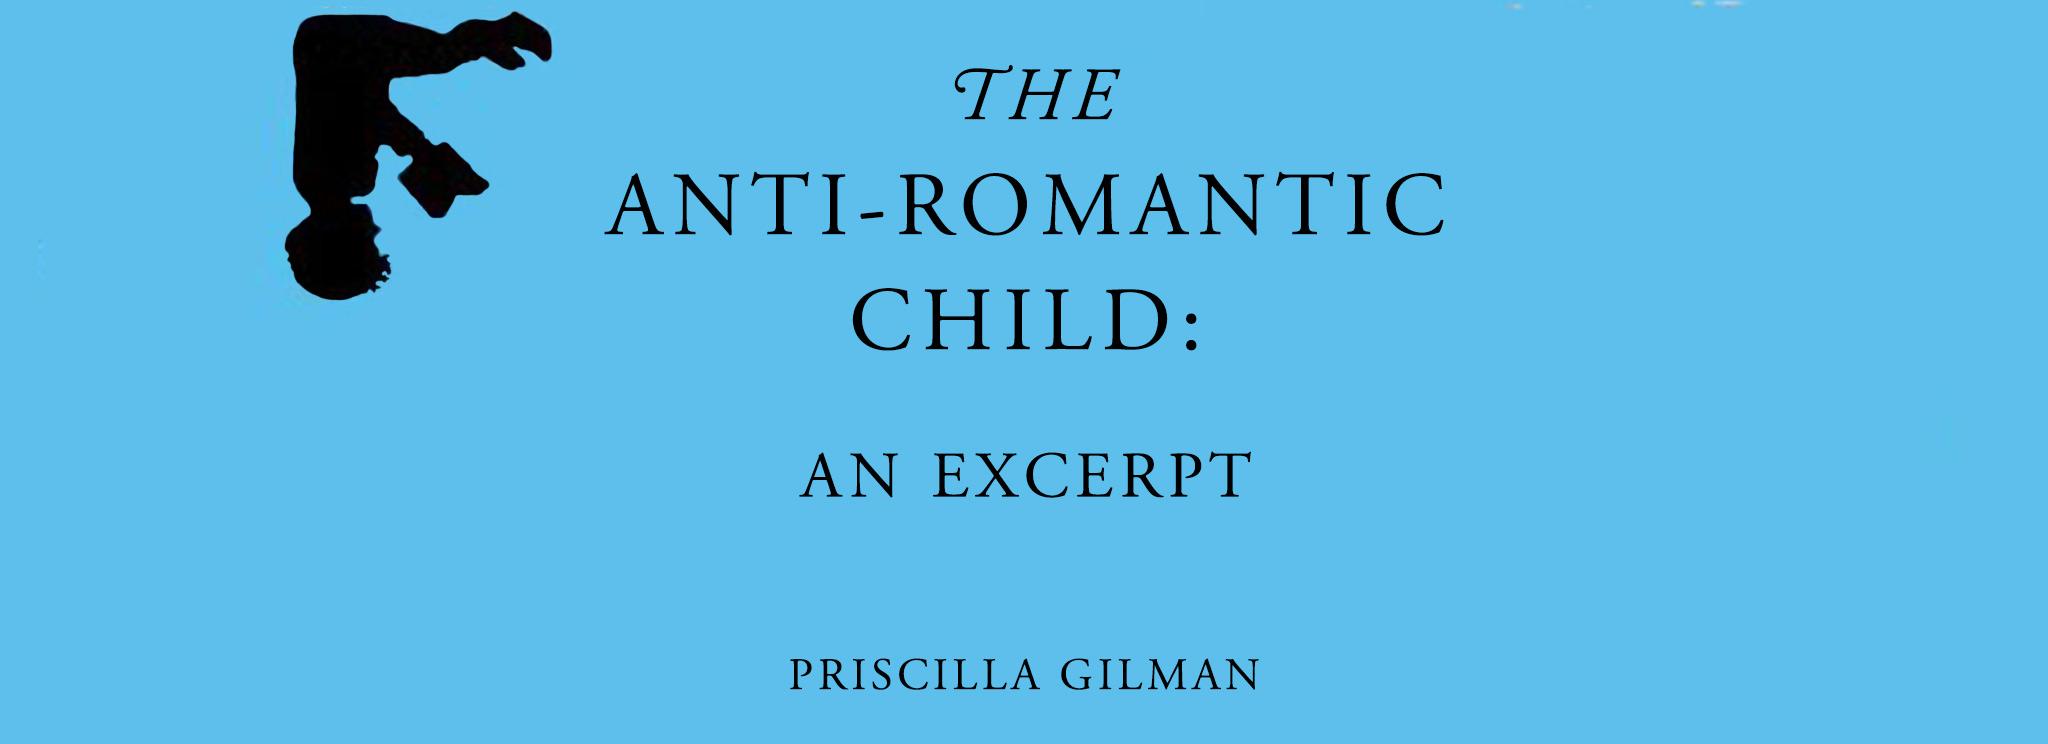 Cover of The Anti-Romantic Child